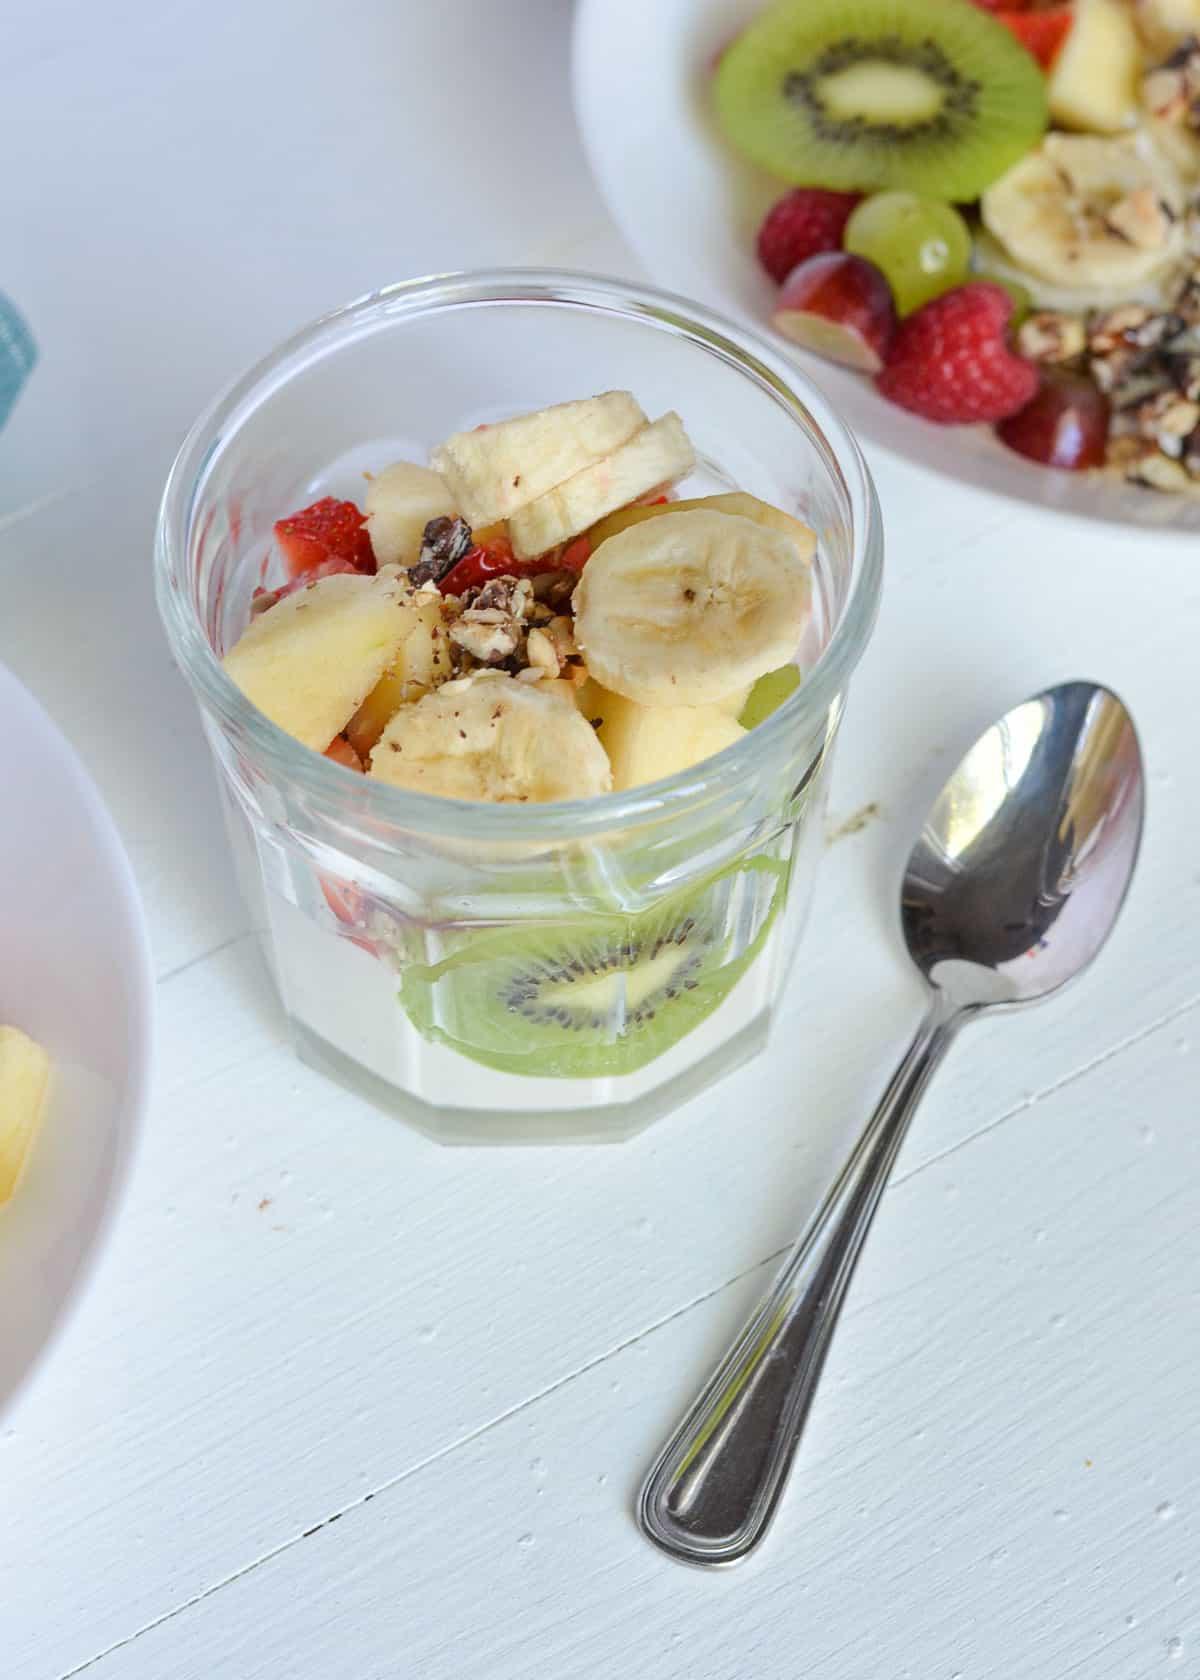 Greek yogurt salad shown in a jar for meal planning.